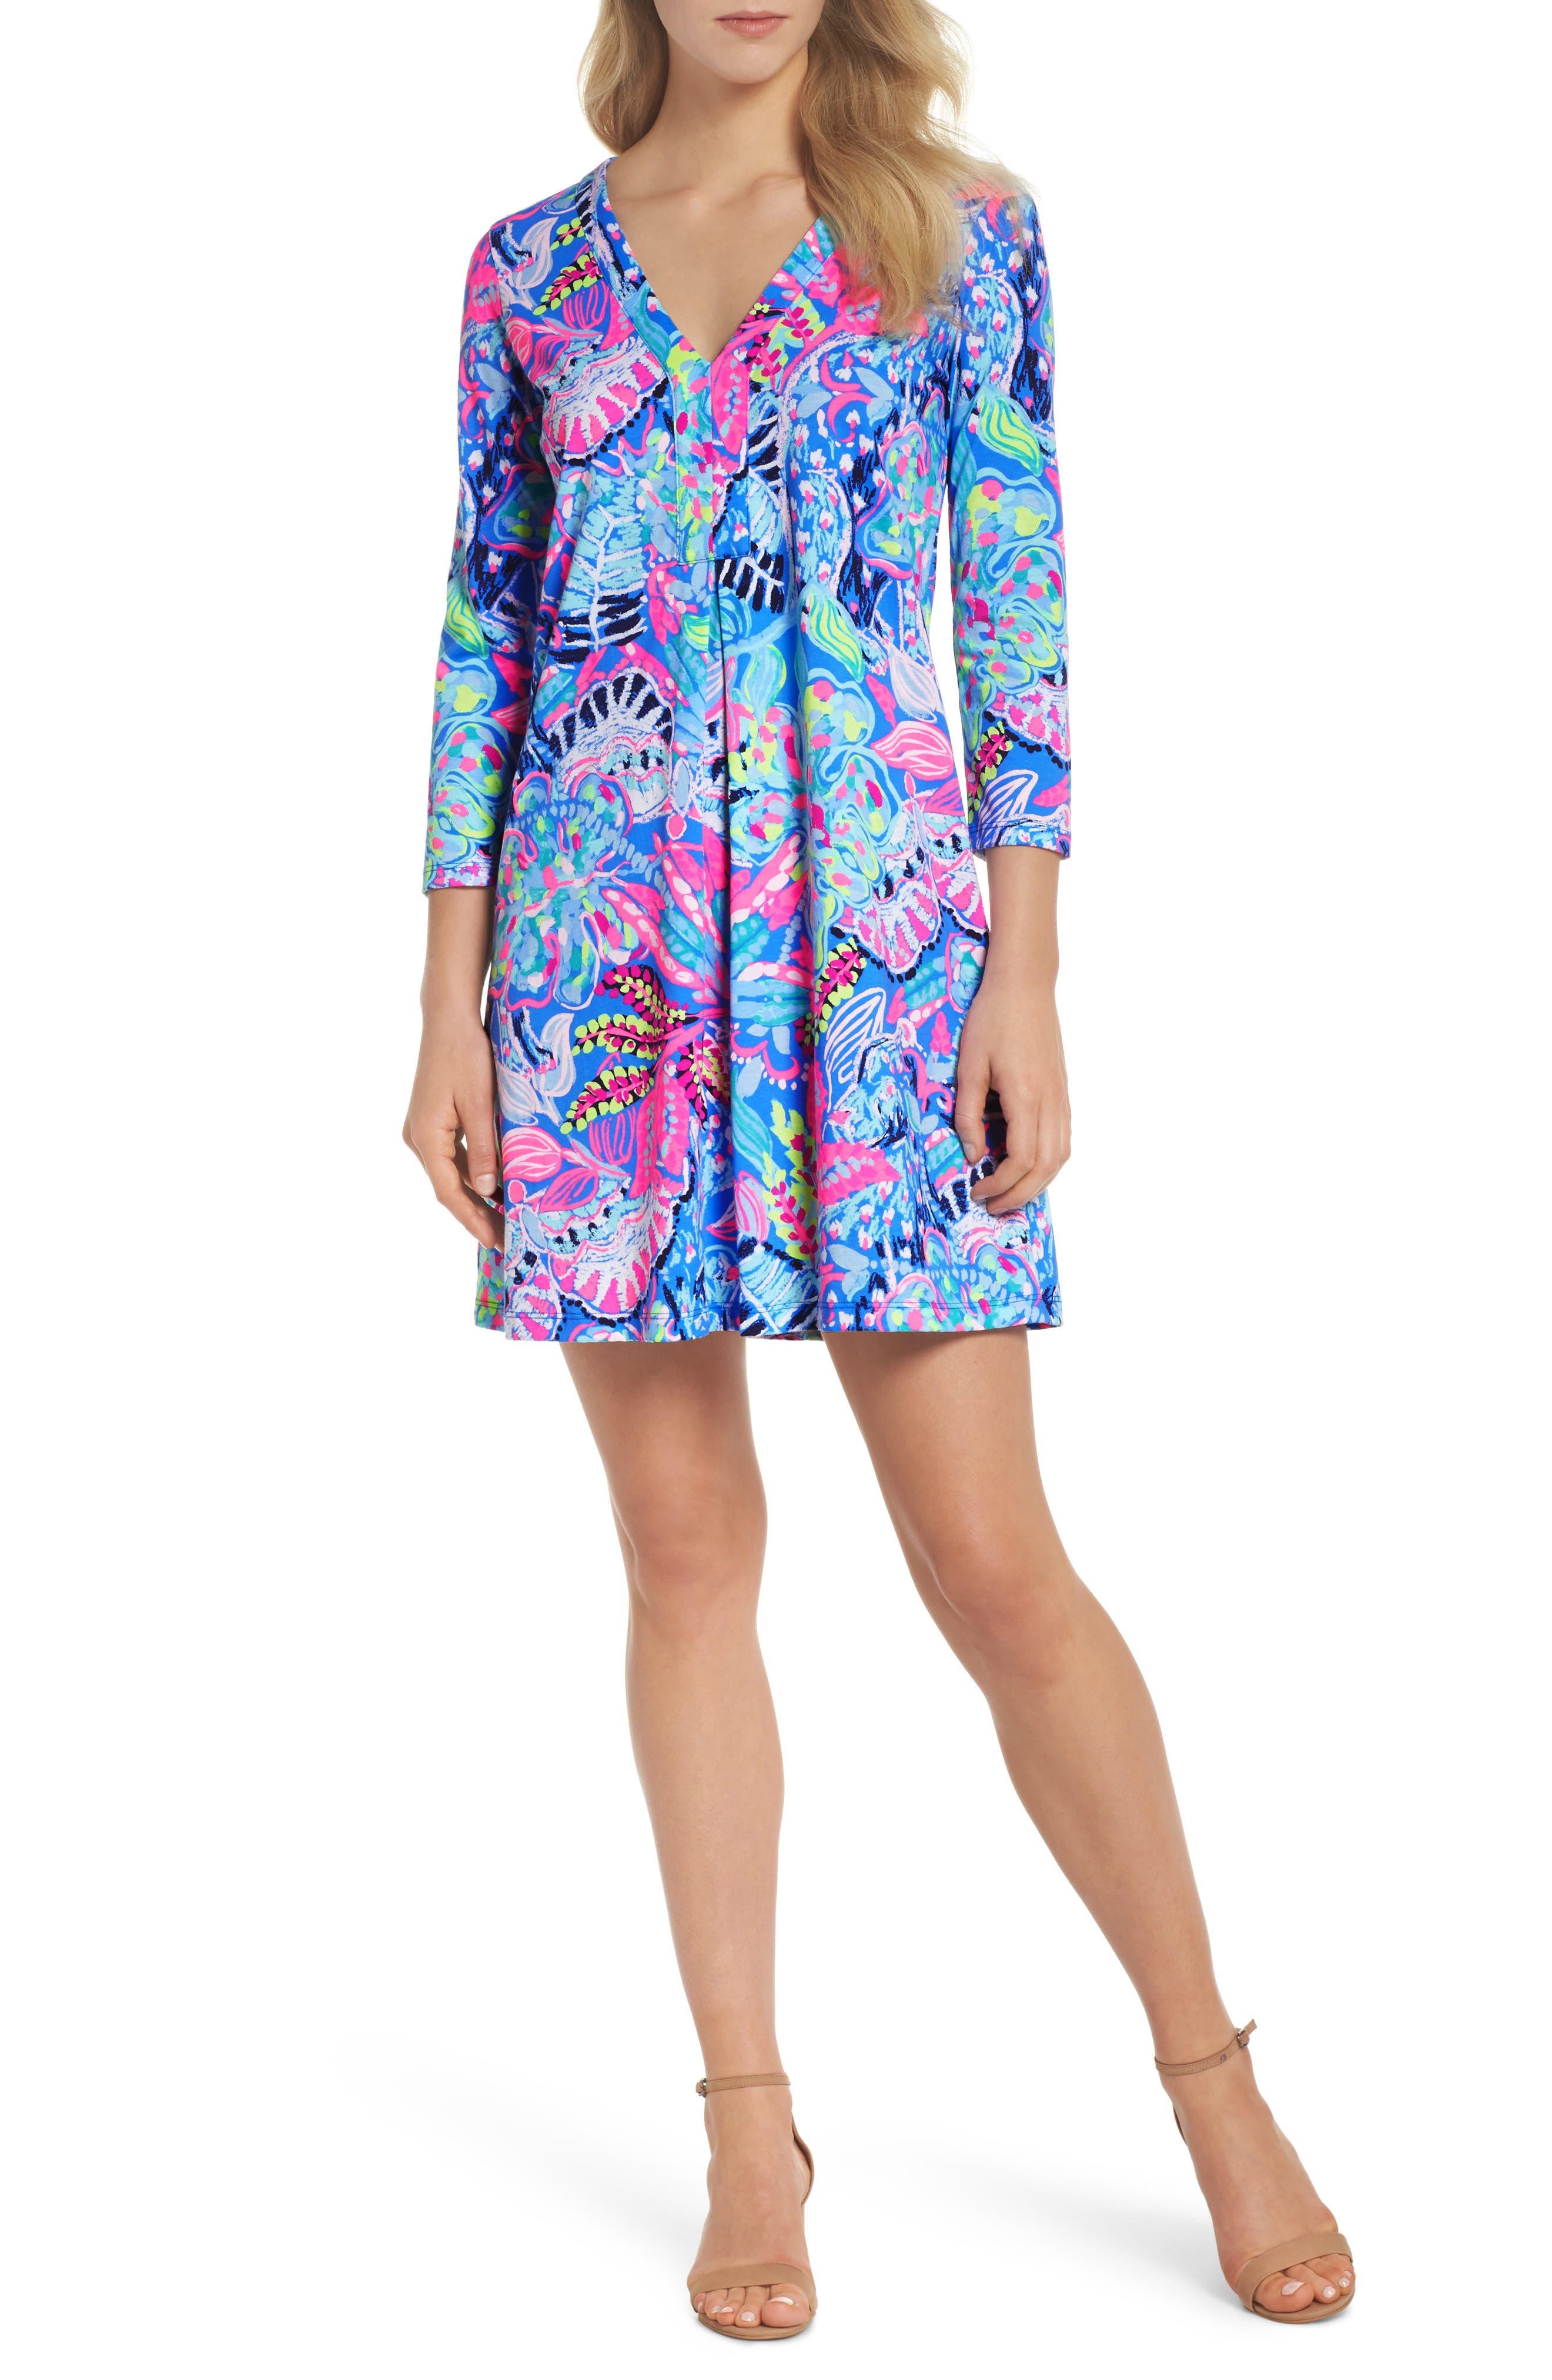 Main Image - Lilly Pulitzer® Amina Swing Dress